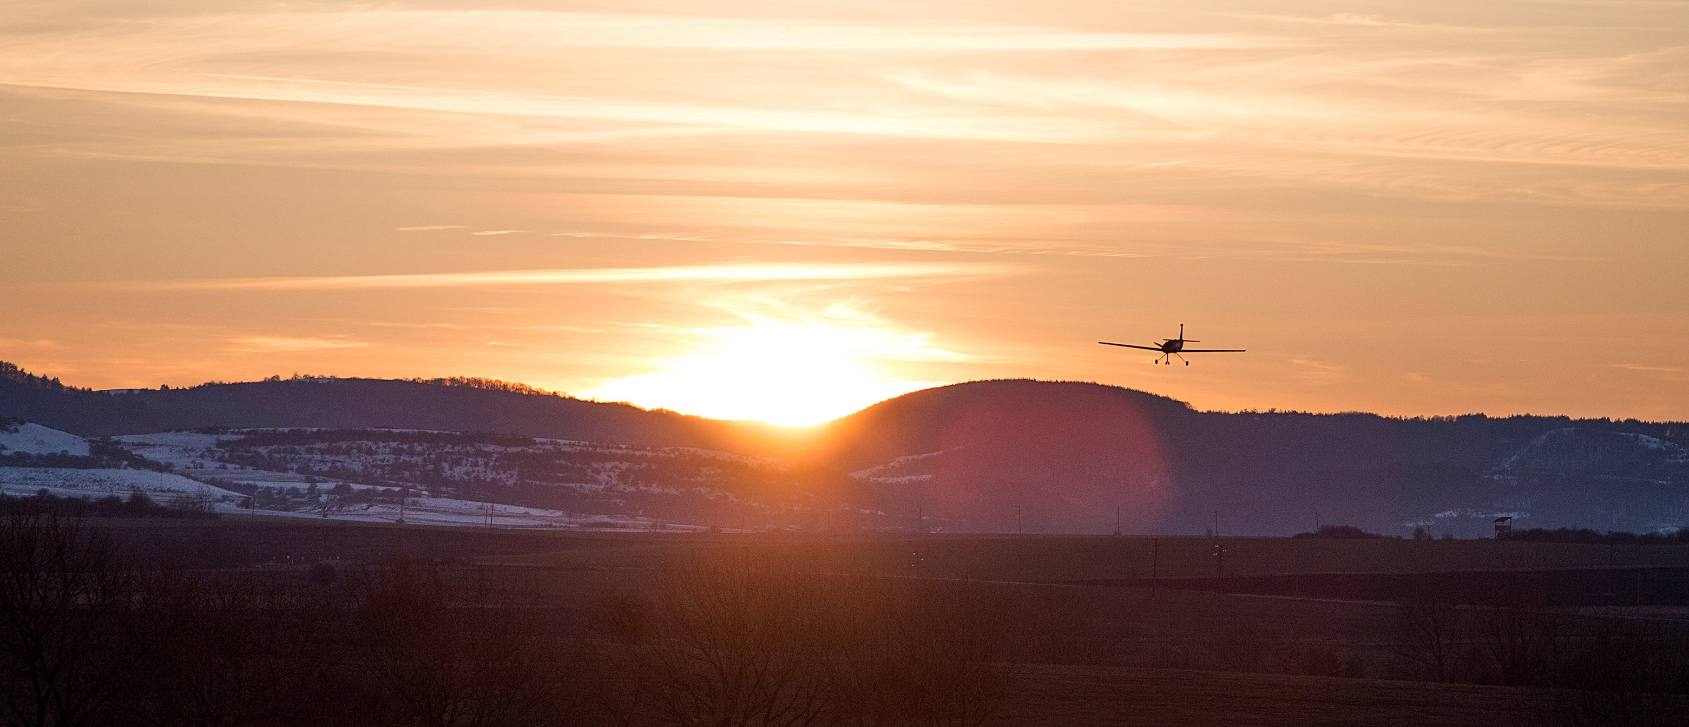 Dronamics : un drone cargo made in Bulgaria